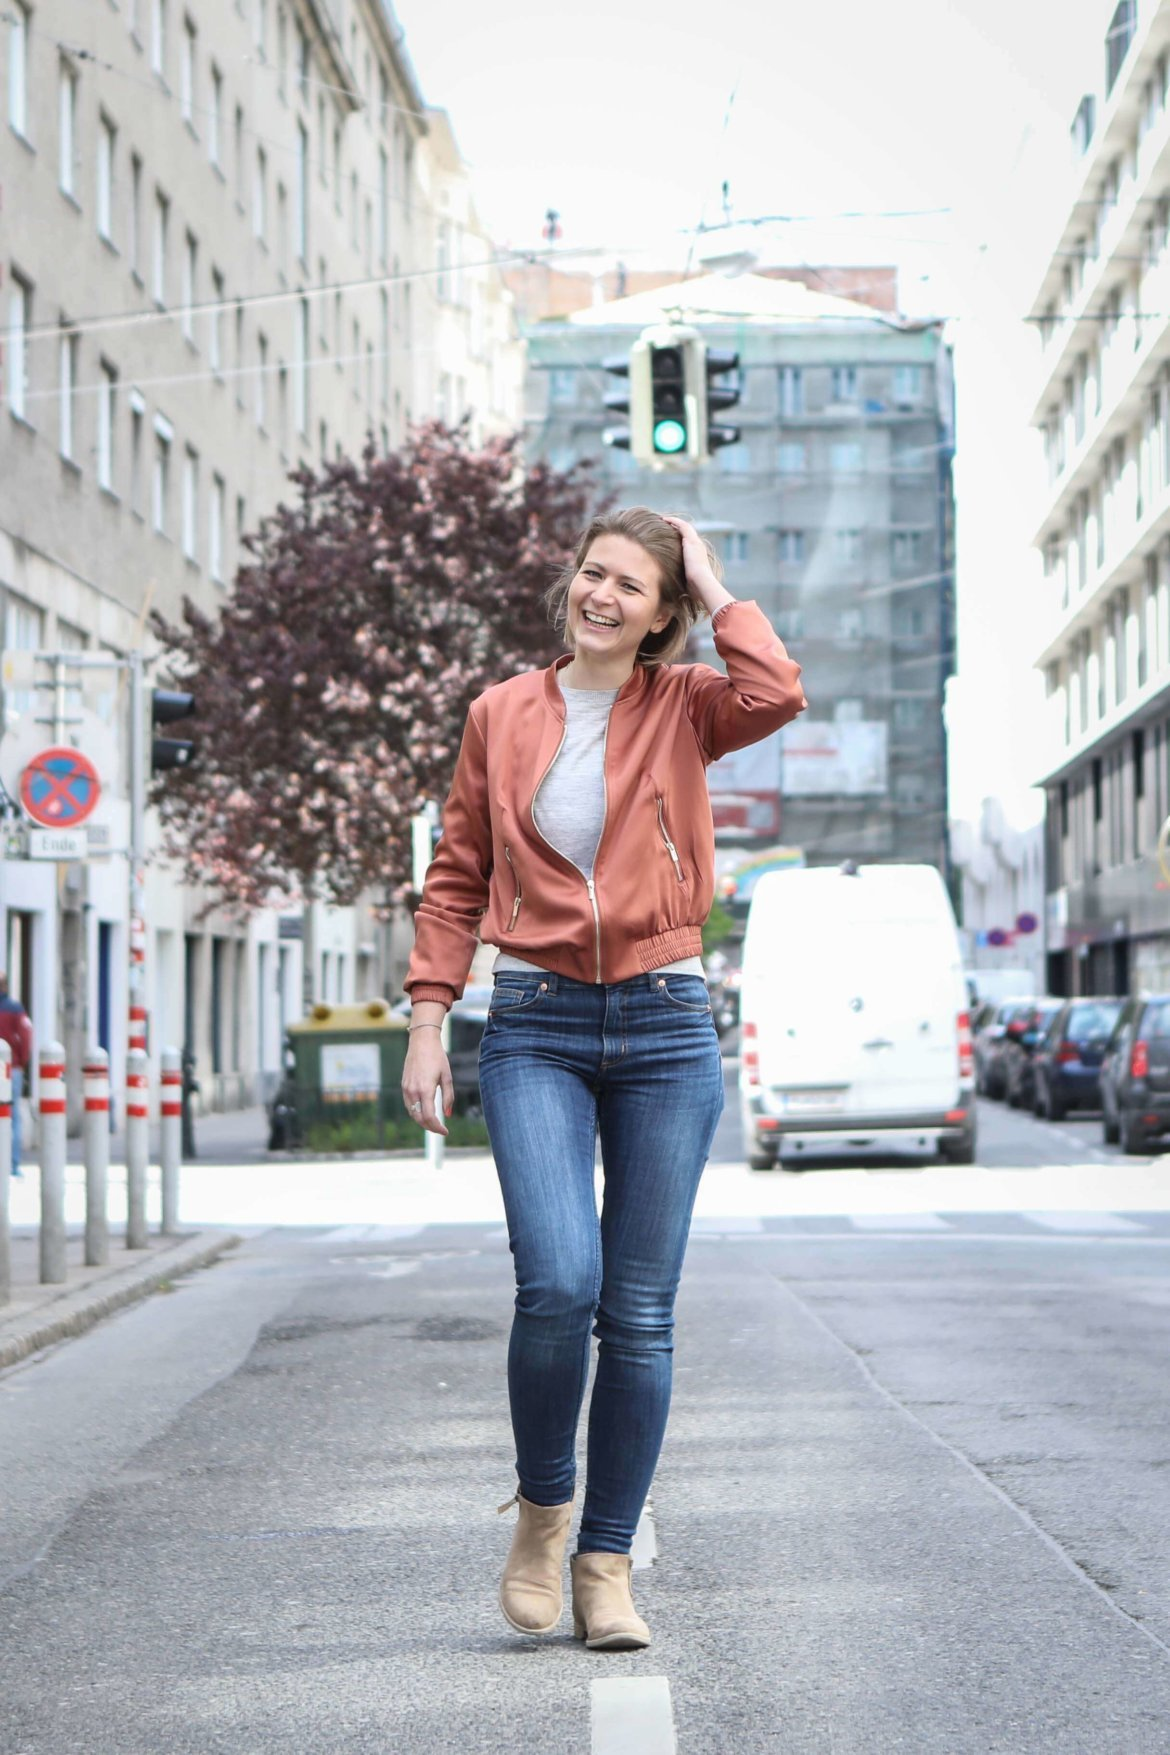 Katharina Moser, Agentur Mosaik